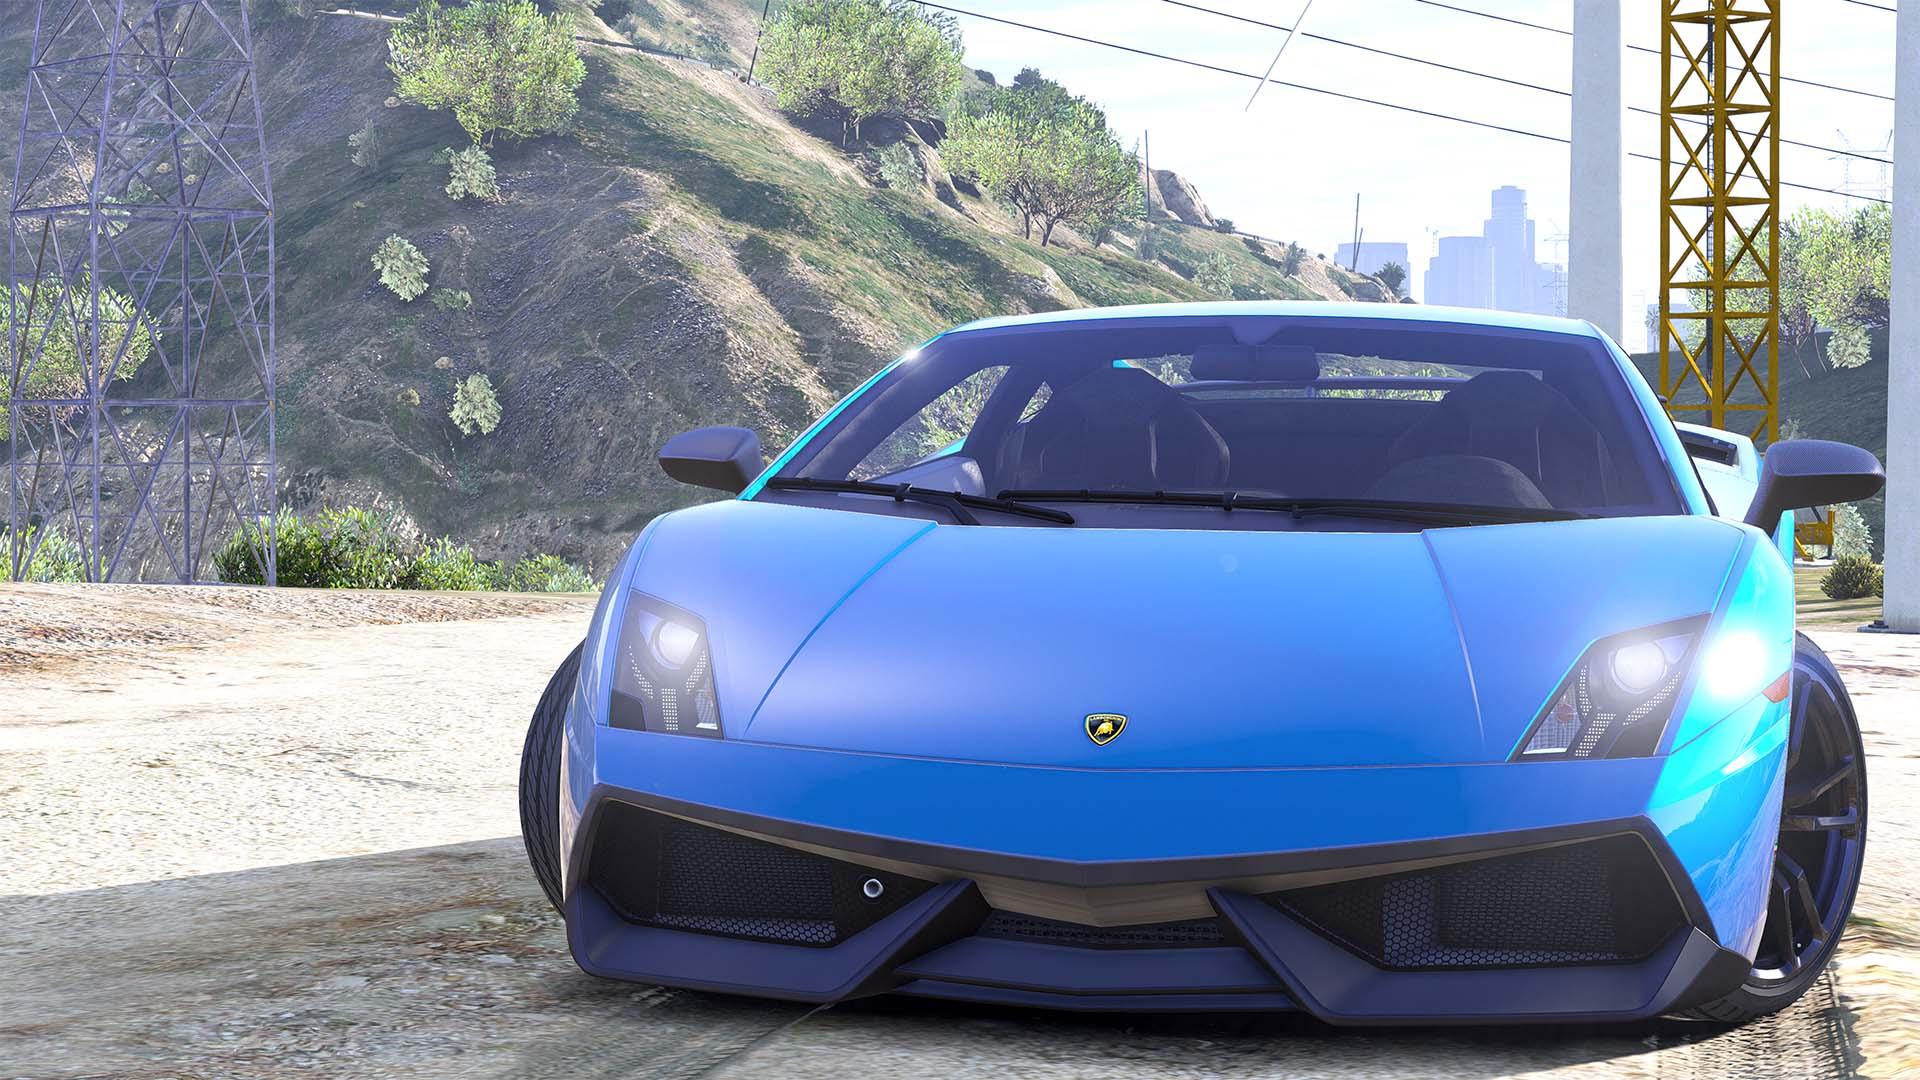 Lamborghini Gallardo Lp570 4 Superleggera 2011 Add On Replace Animated Template Gta5